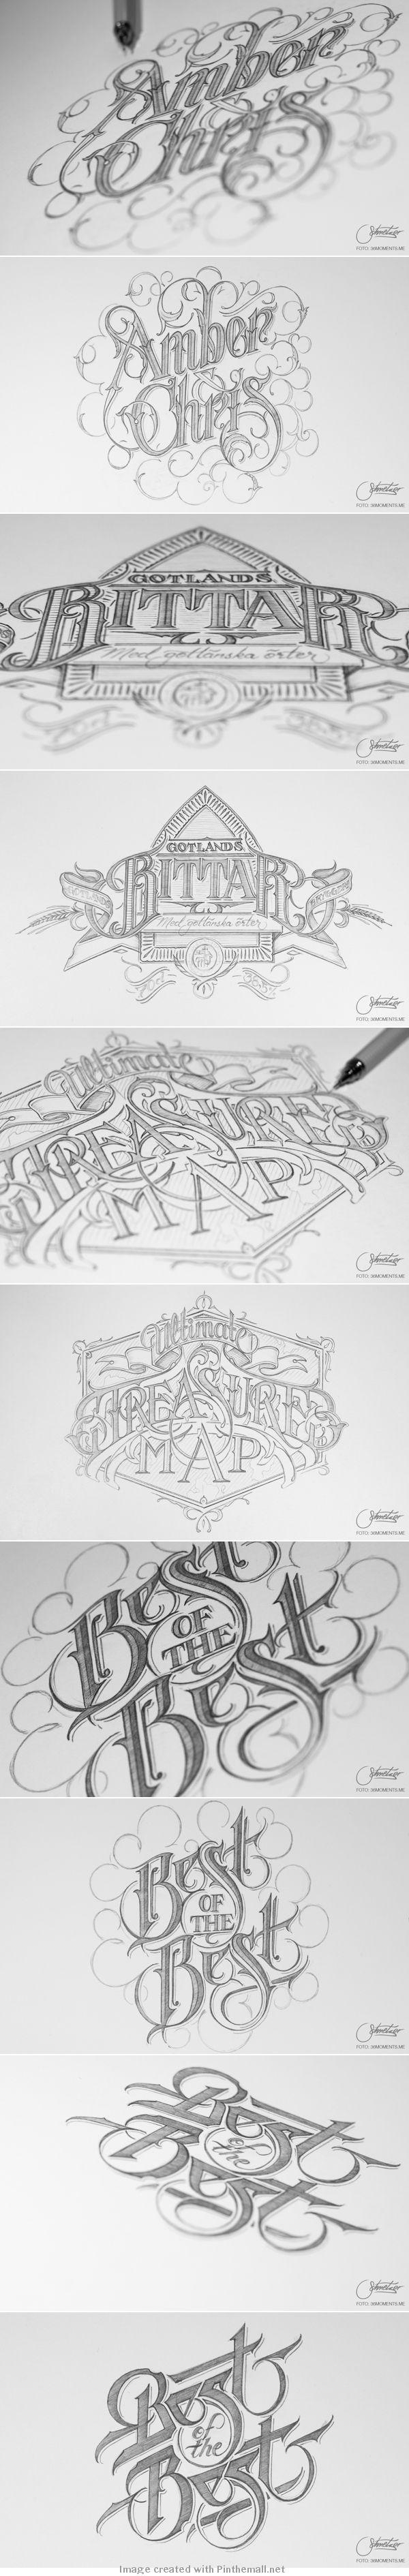 Hand+lettering+by+Martin+Schmetzer+via+Behance+-+created+via+http://pinthemall.net